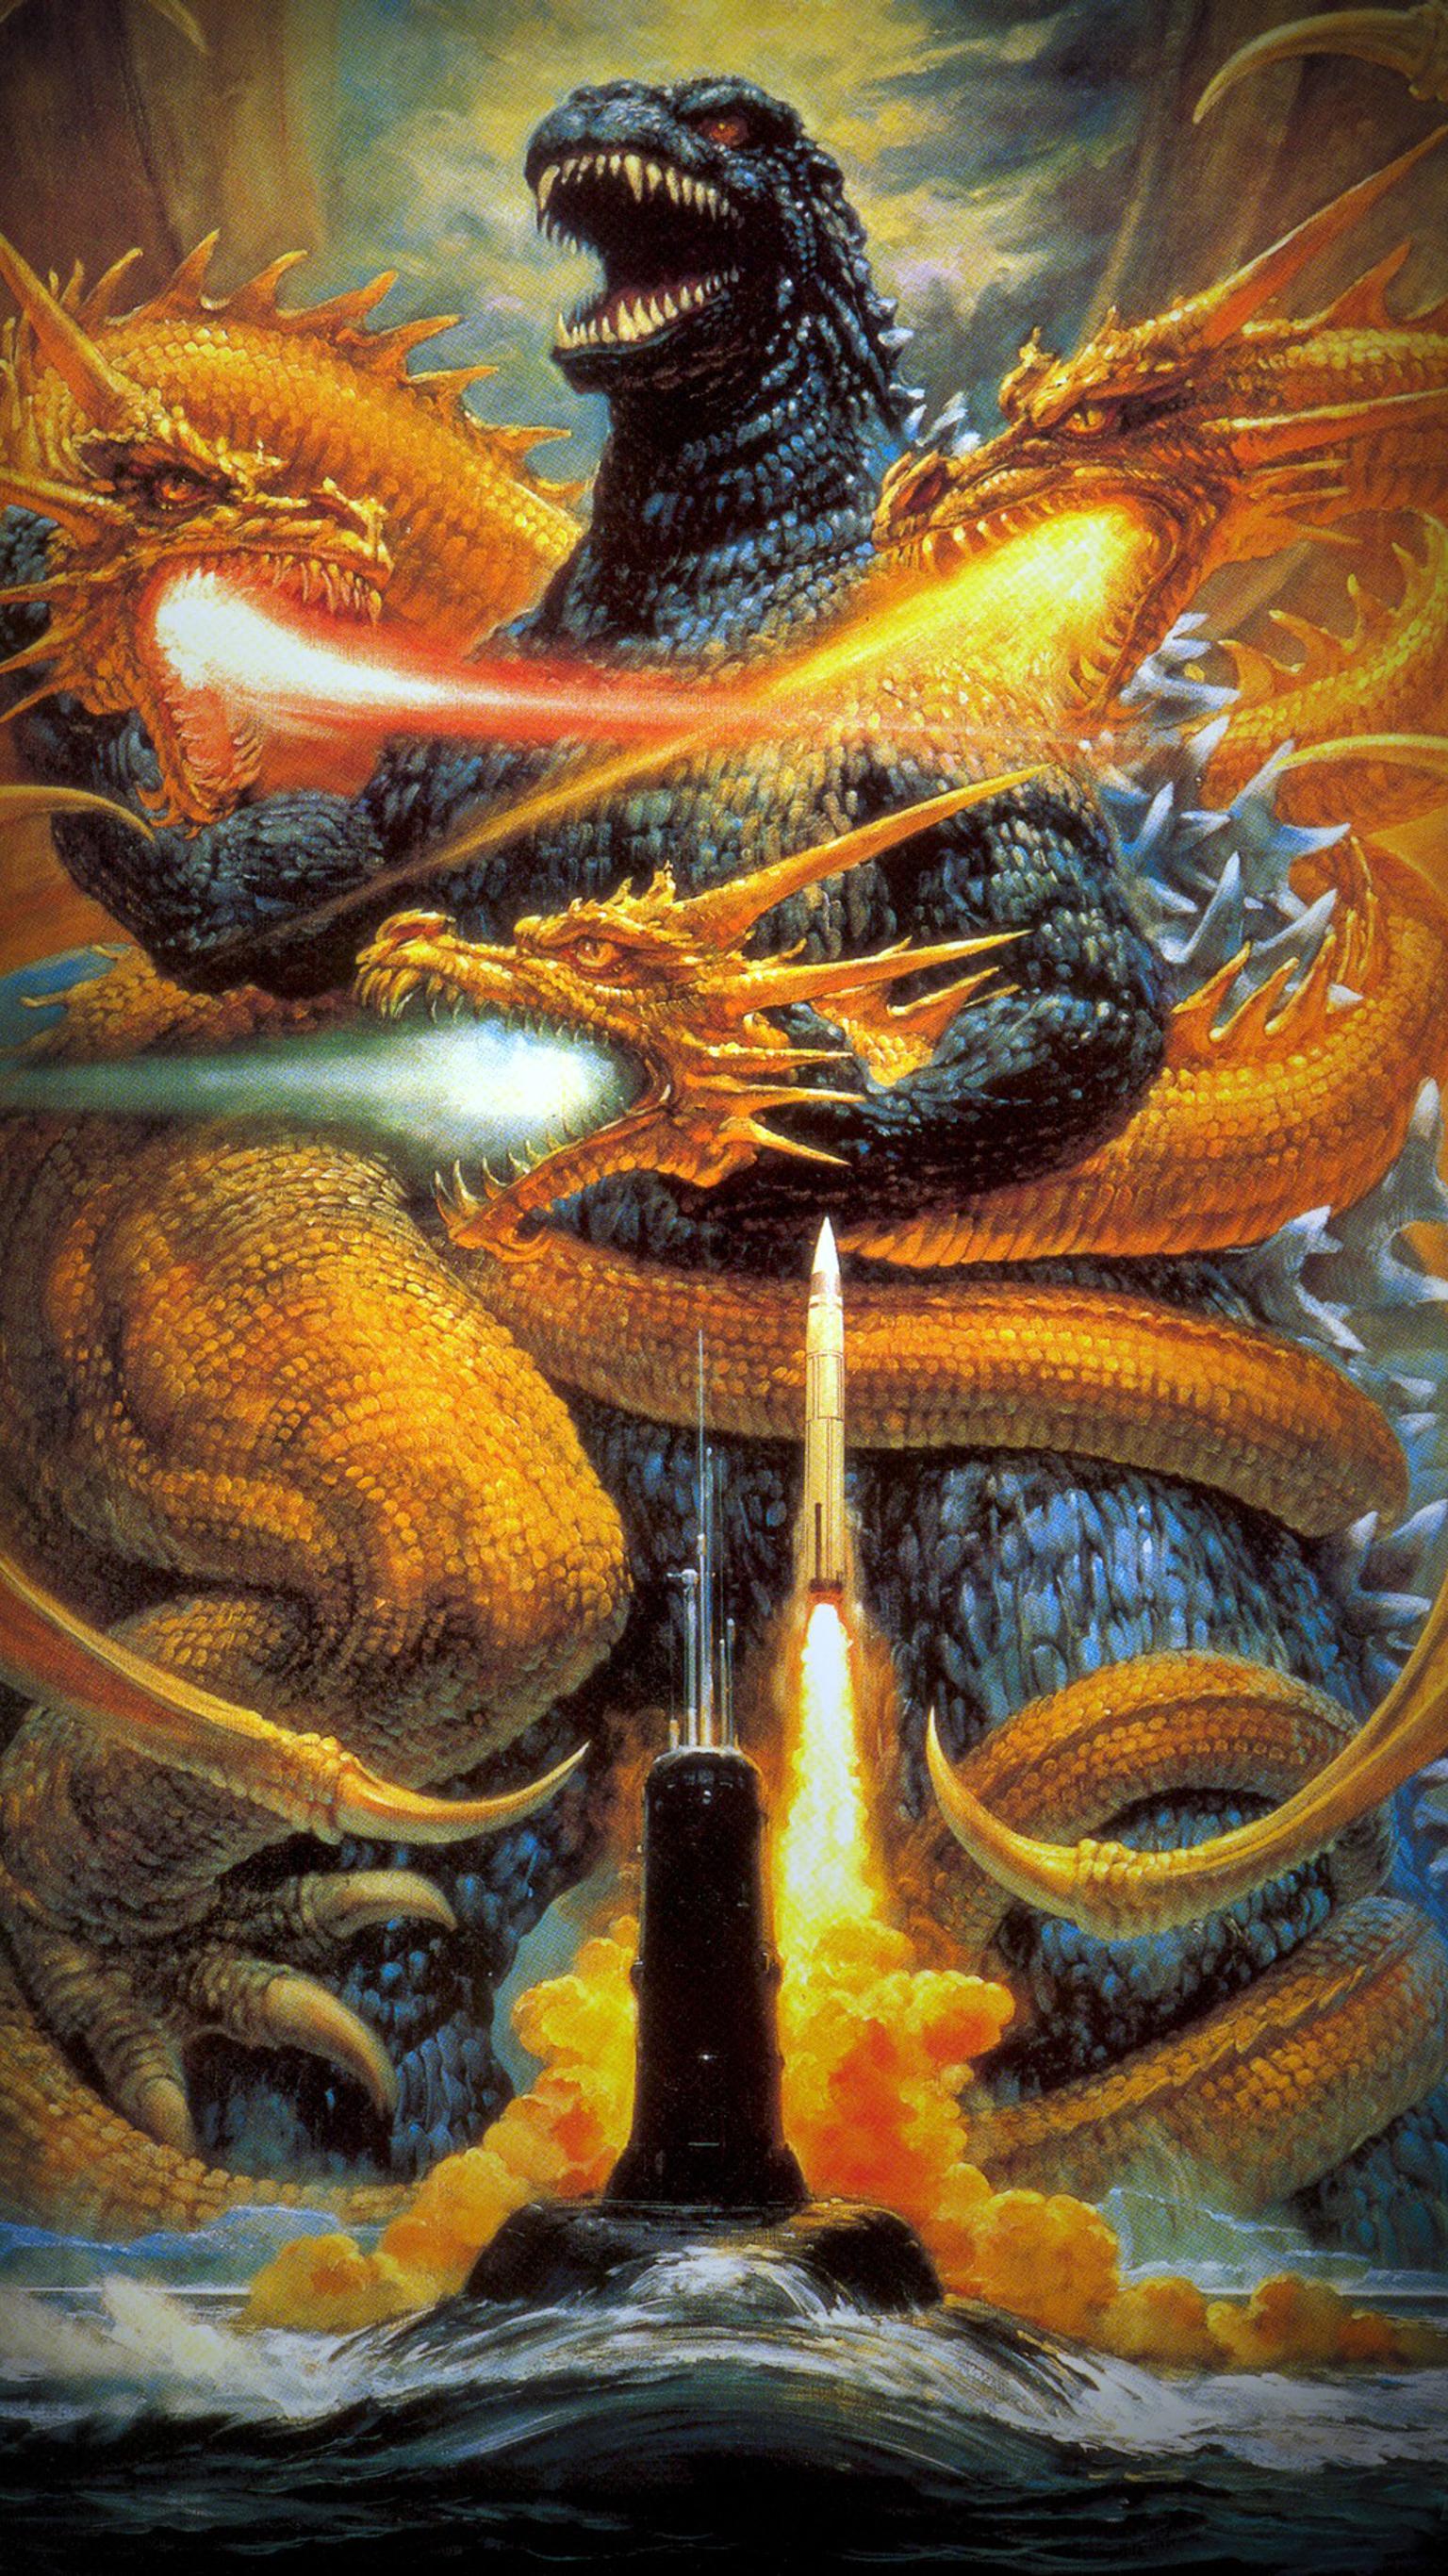 Godzilla vs King Ghidorah 1991 Phone Wallpaper Moviemania 1536x2732